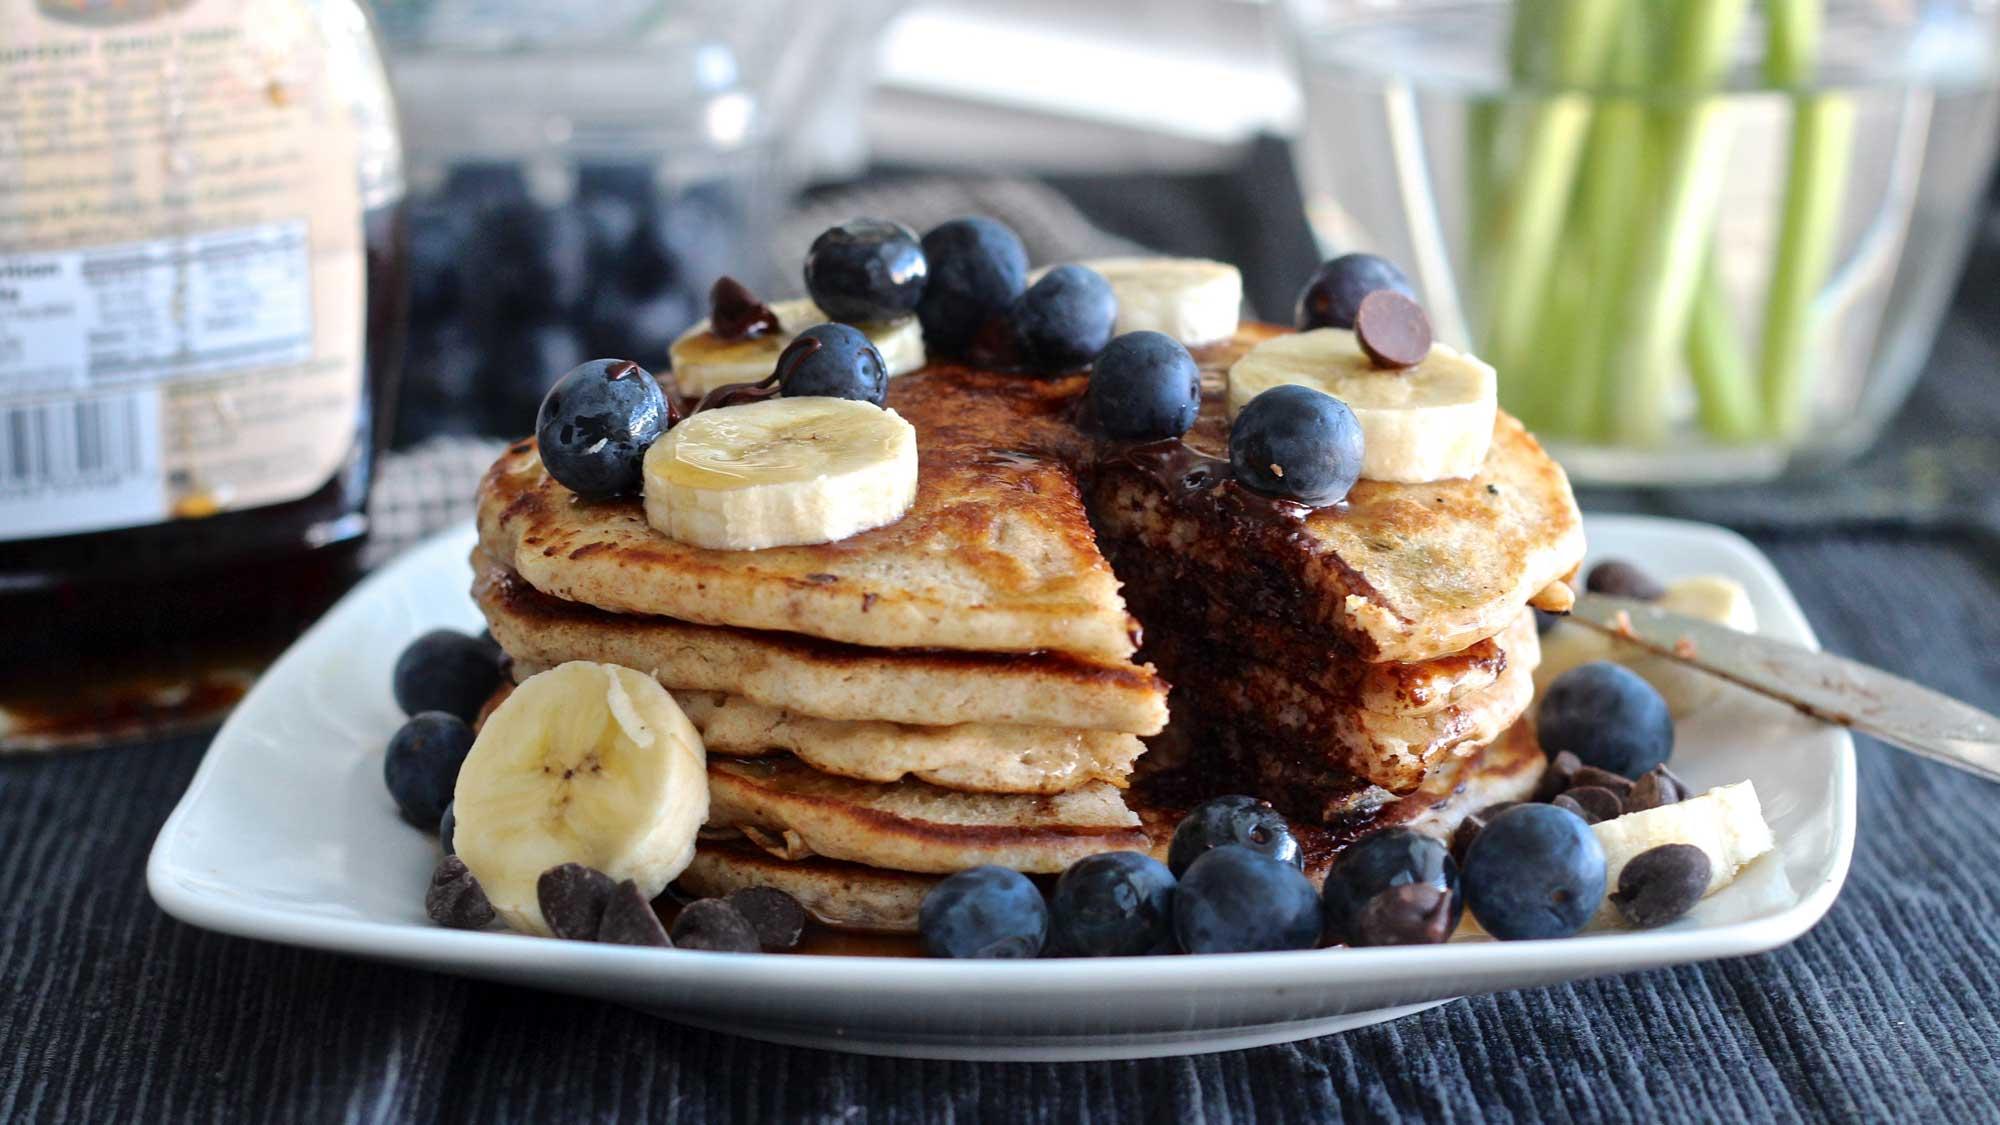 Homemade-Banana-Chocolate-Chip-Pancakes-with-Fresh-Fruit-521150-edited.jpg